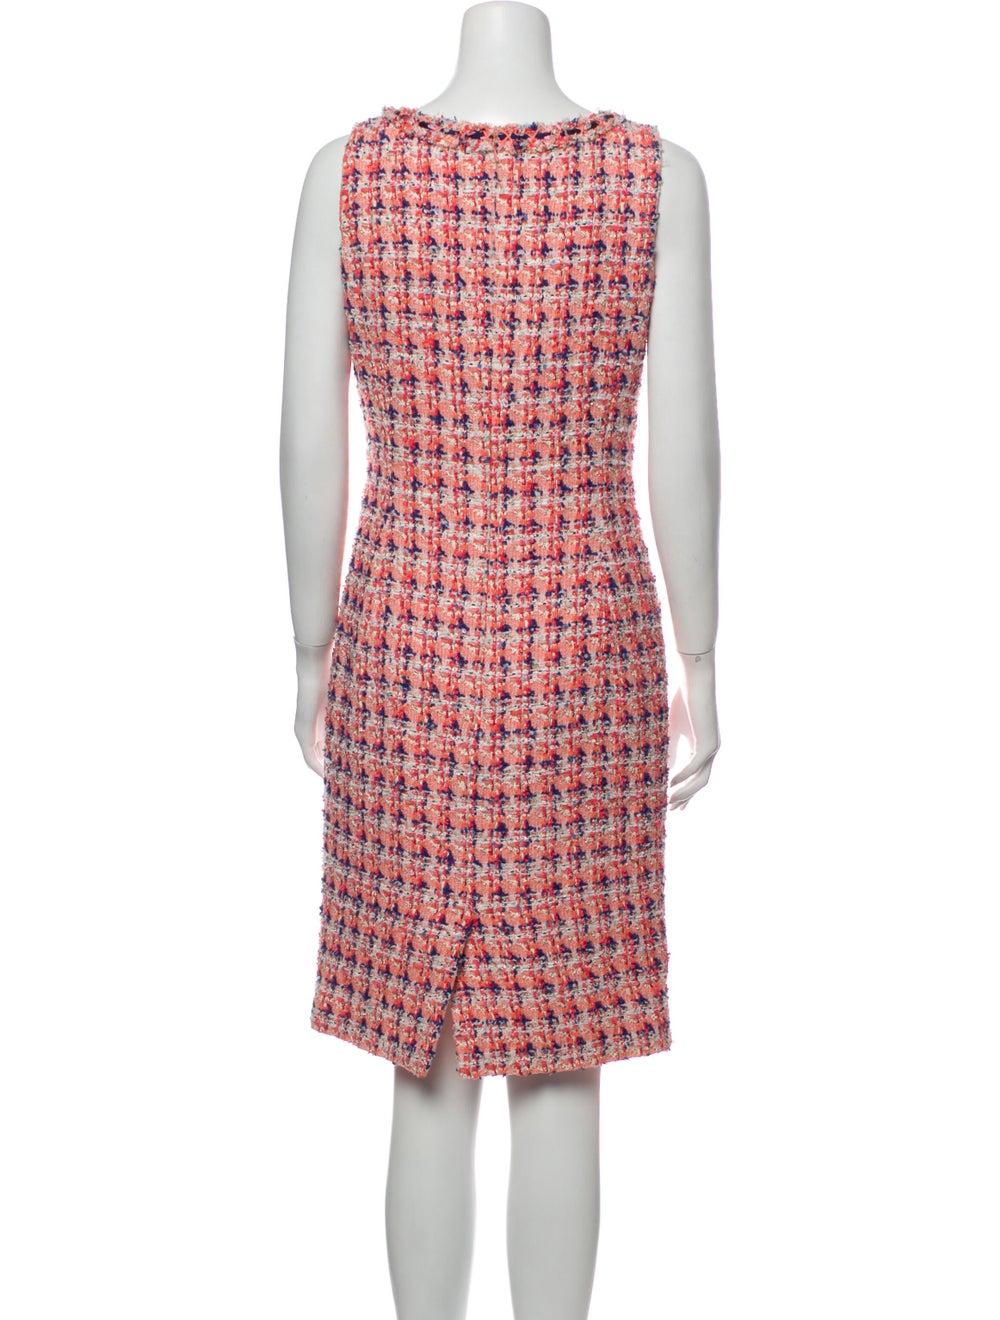 Oscar de la Renta Printed Knee-Length Dress Pink - image 3